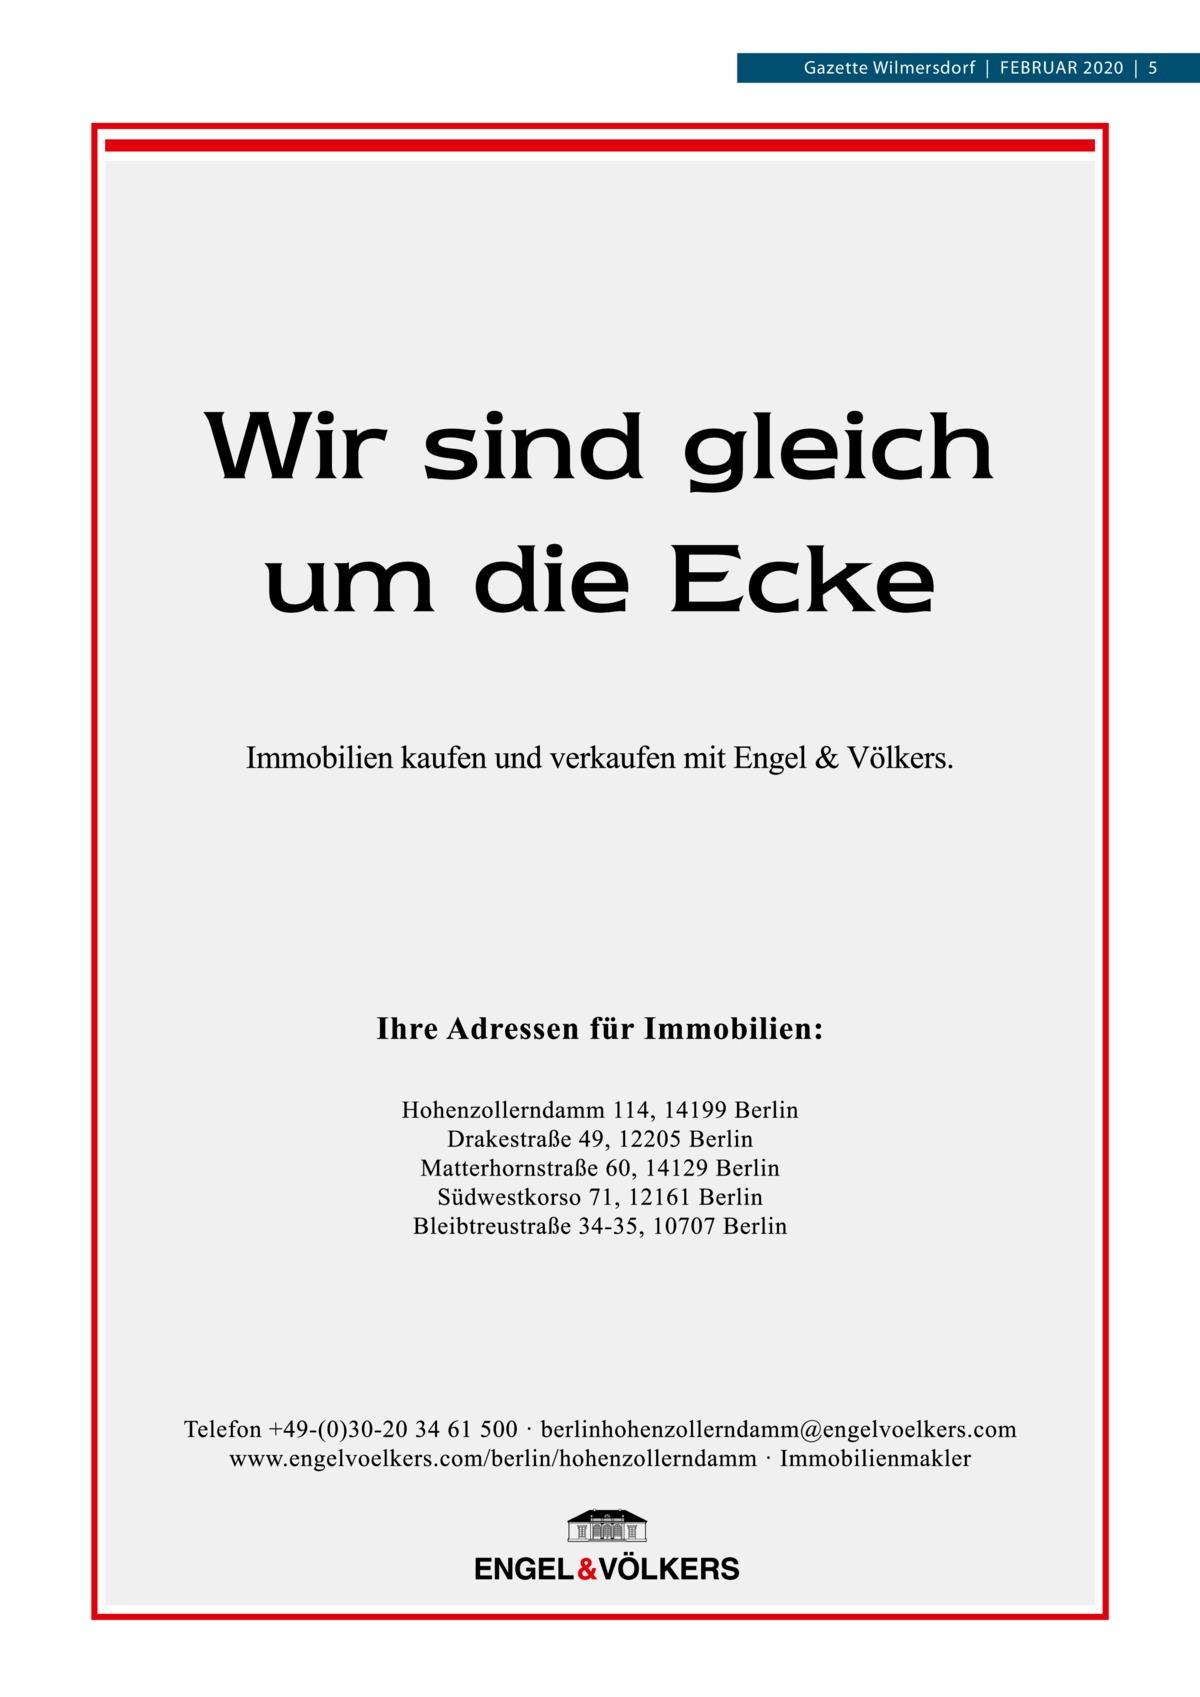 Gazette Wilmersdorf|Februar 2020|5